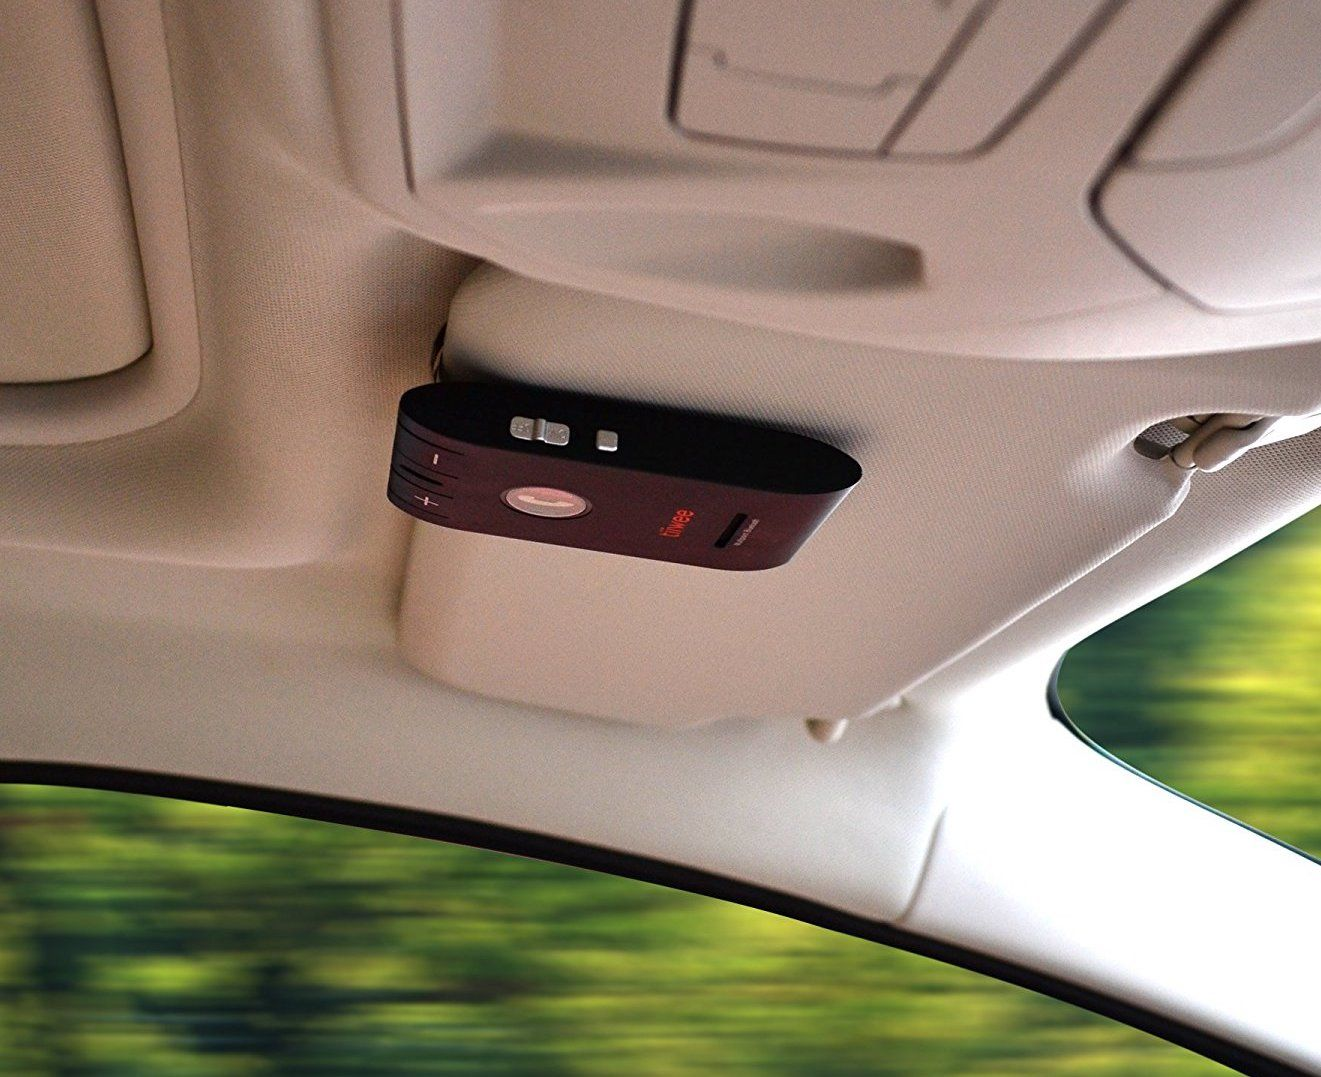 Tiiwee GT - Kit Manos Libres Para Coche Bluetooth 4.0 Negro Visera ...